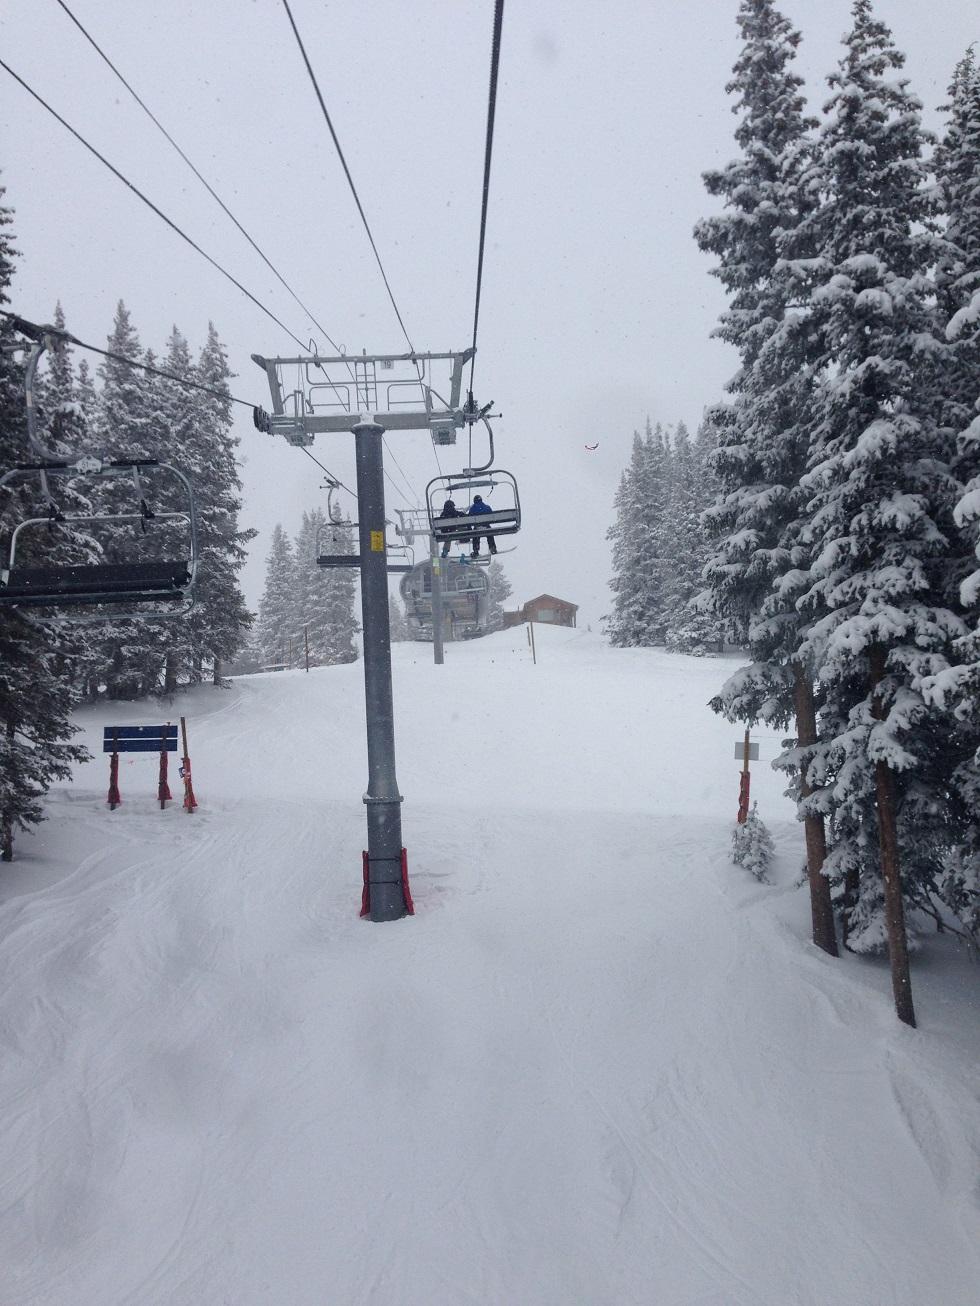 Vail滑雪场 (10).JPG